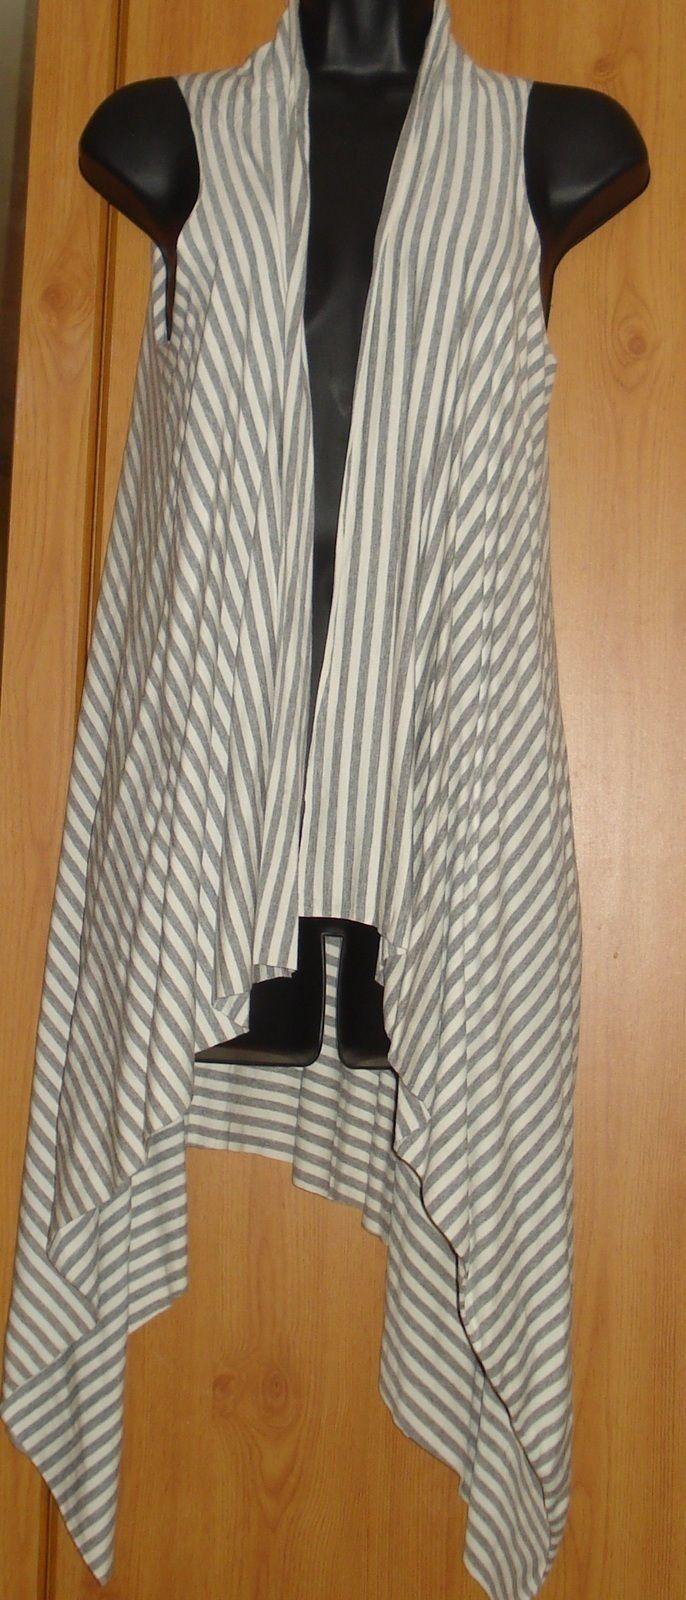 A Rough Cut Asymmetrical Cardigan #howto #tutorial